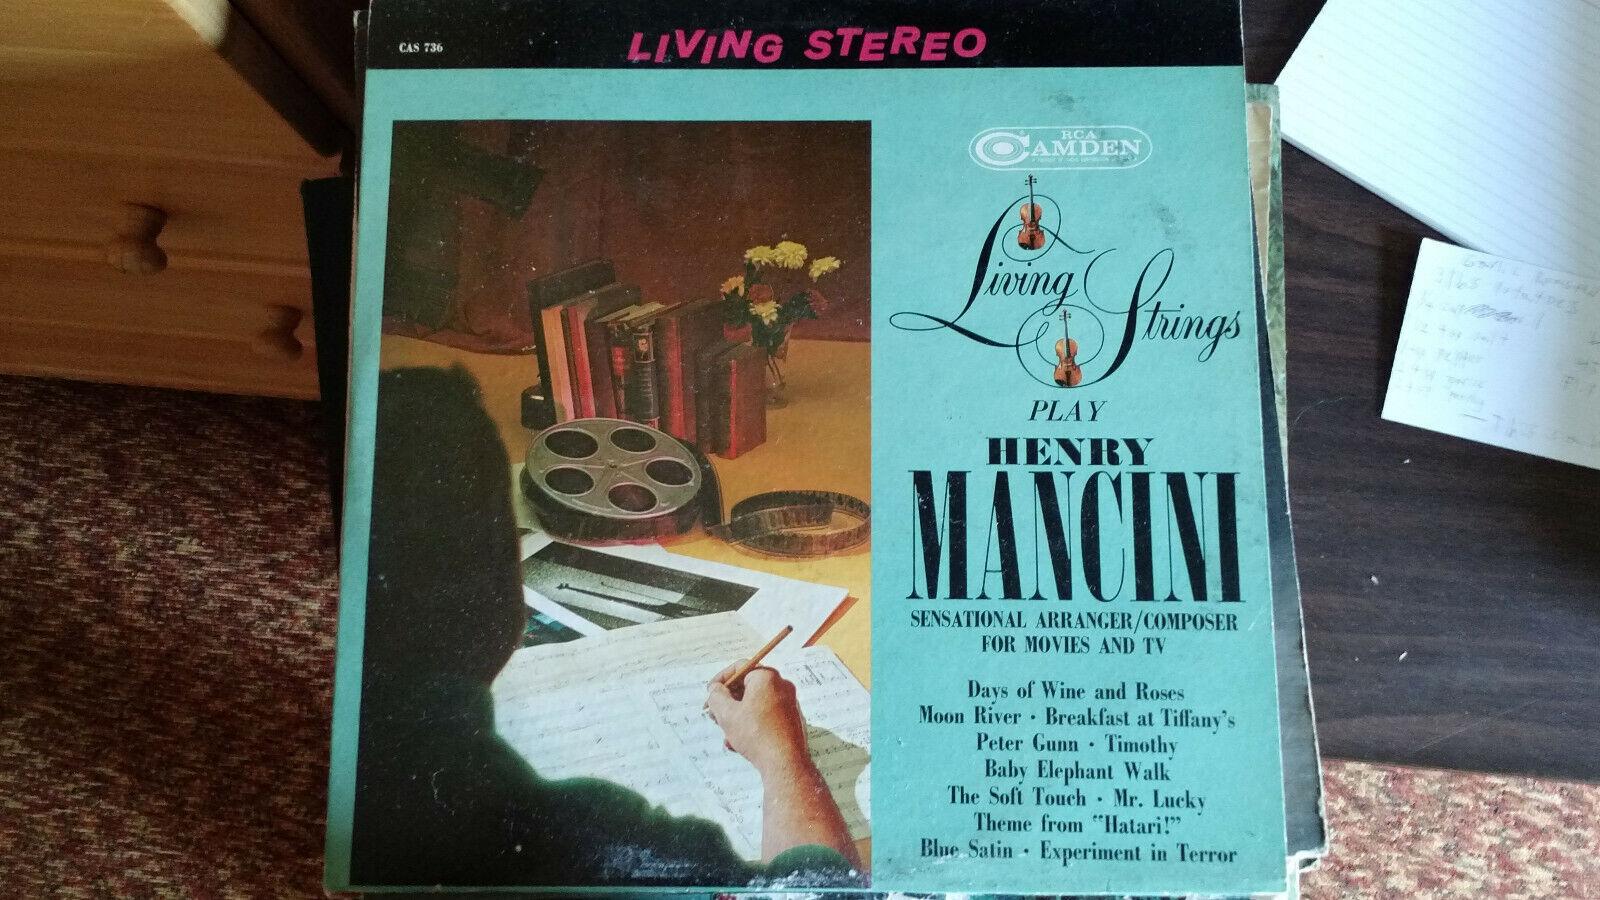 Living Strings Play Henry Mancini Record - $1.39